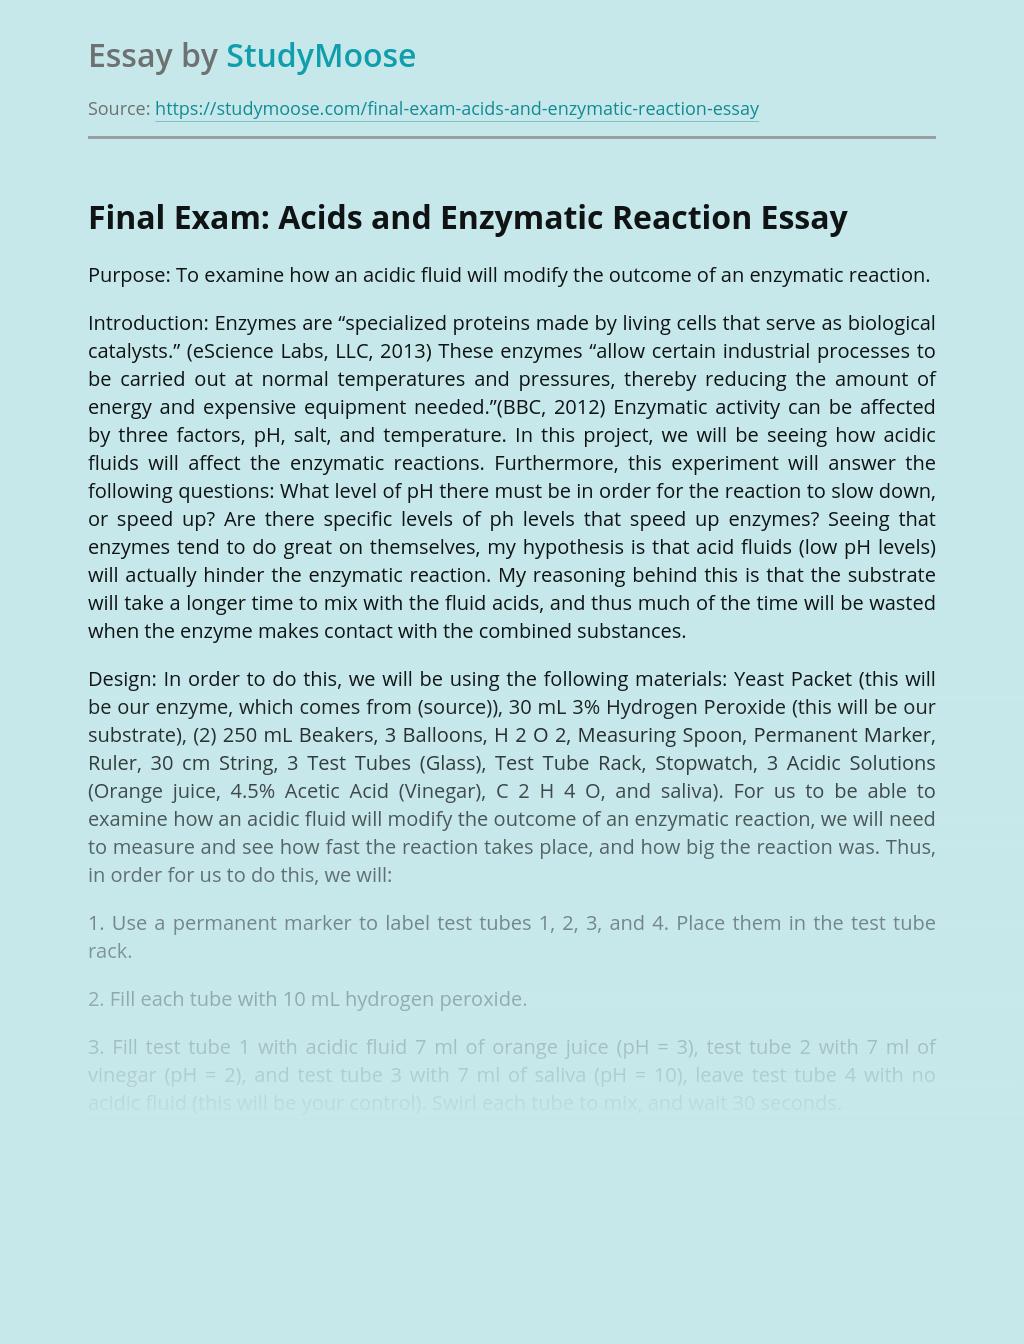 Final Exam: Acids and Enzymatic Reaction